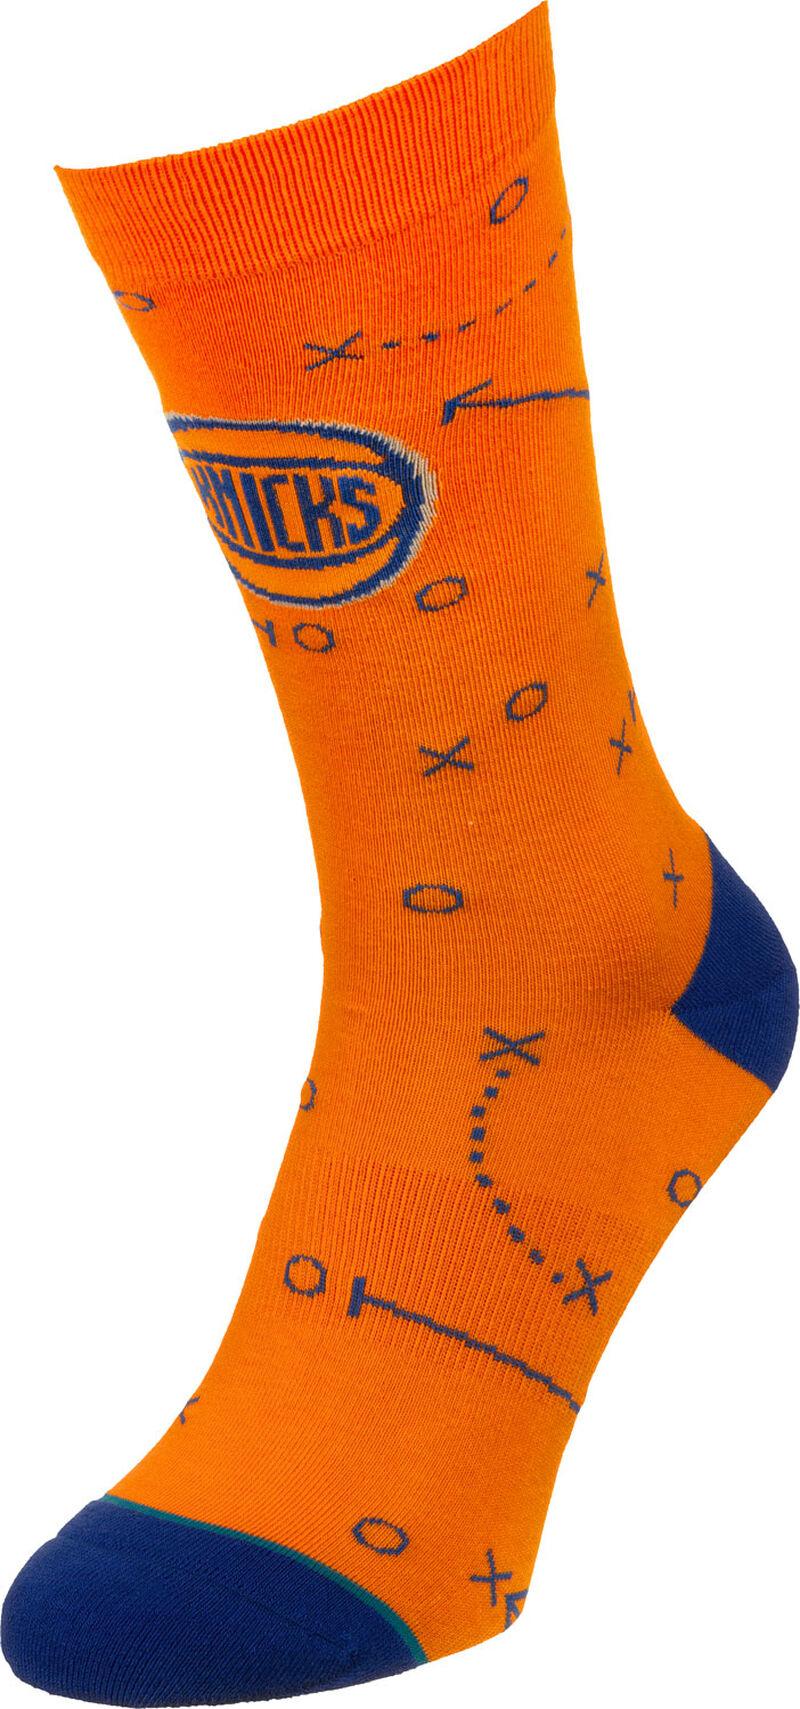 Knicks Playbook